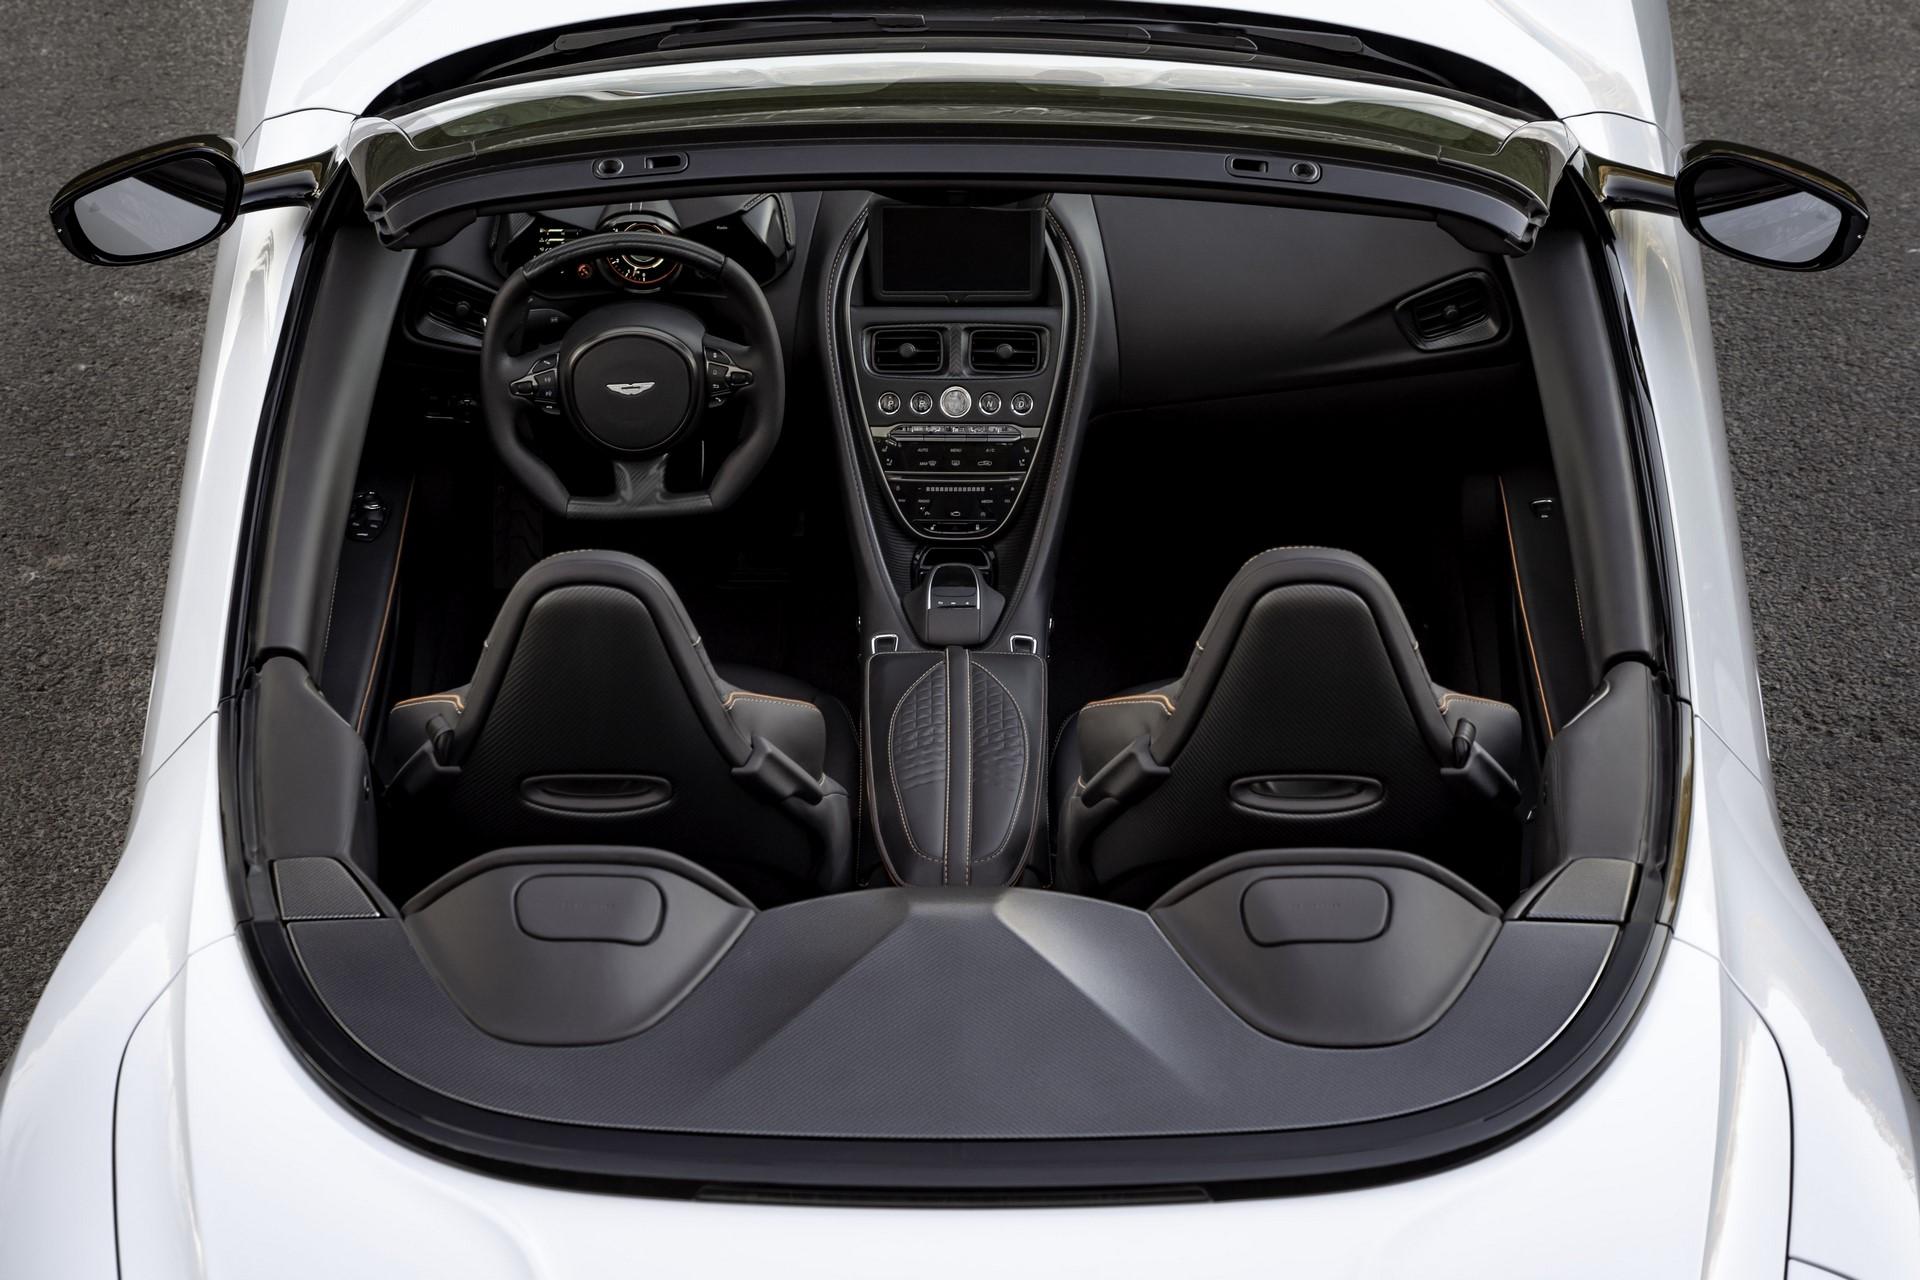 Aston-Martin-DBS-Superleggera-Volante-11